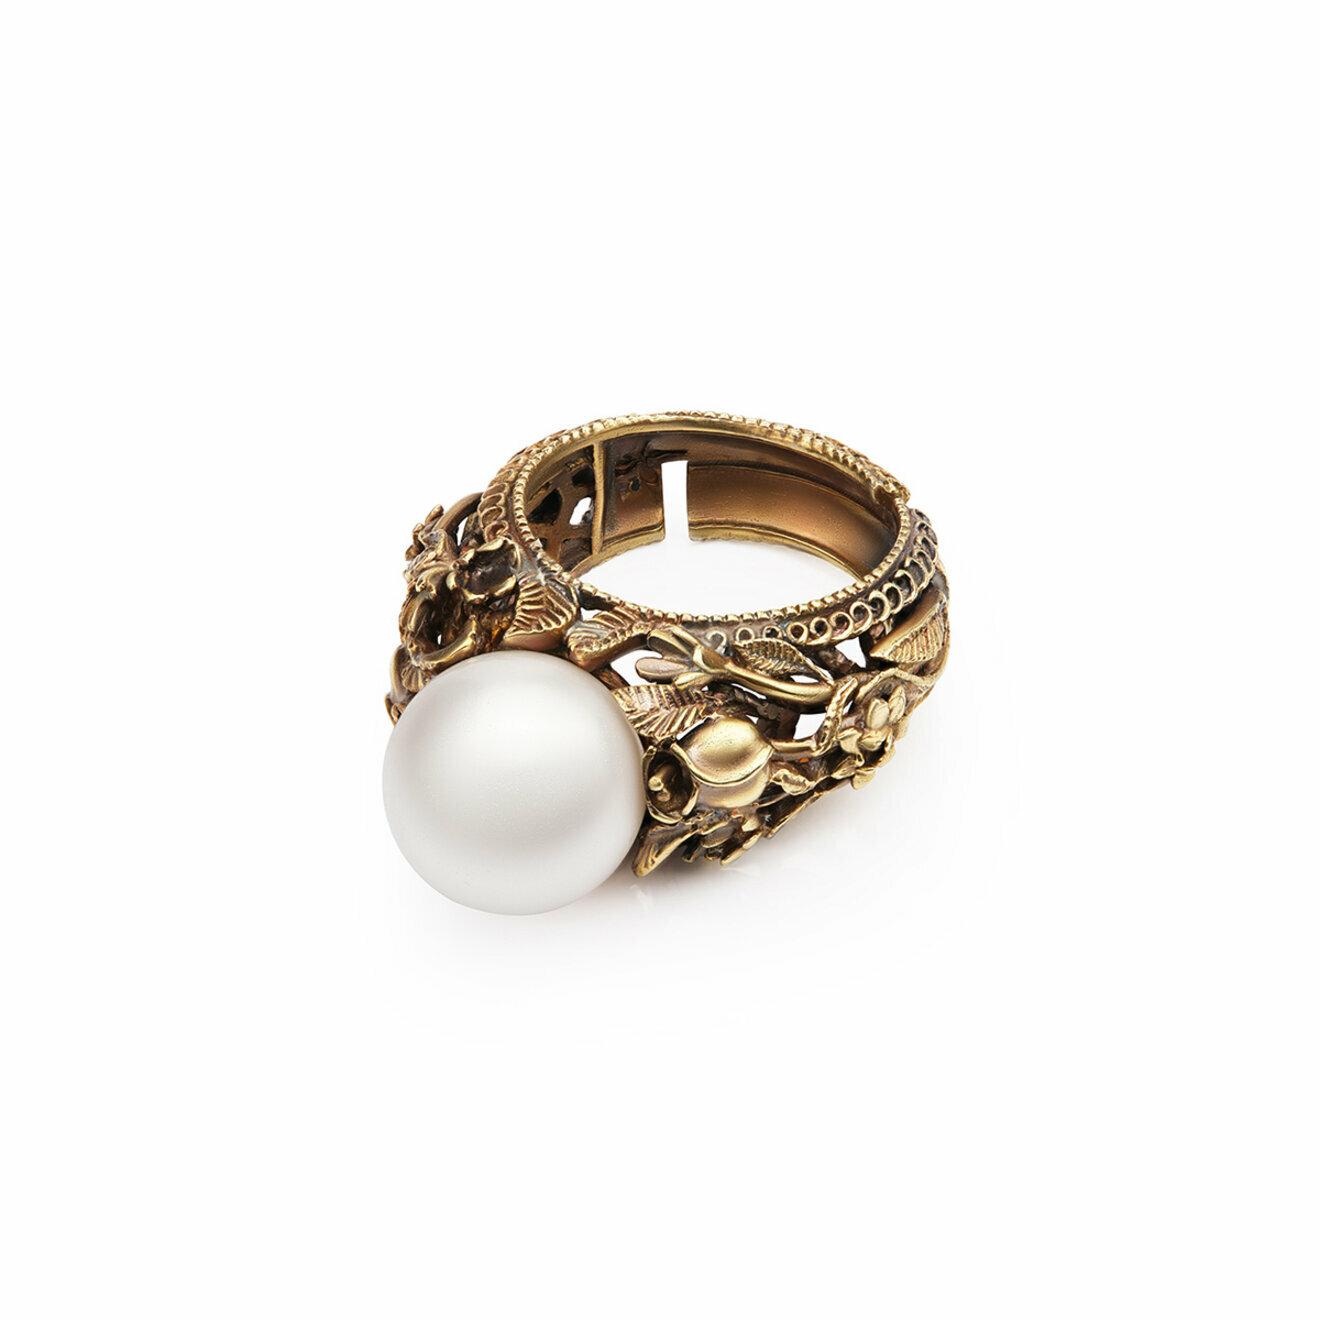 di Fiore di Firenze Позолоченное кольцо Mazzo di fiori с жемчугом